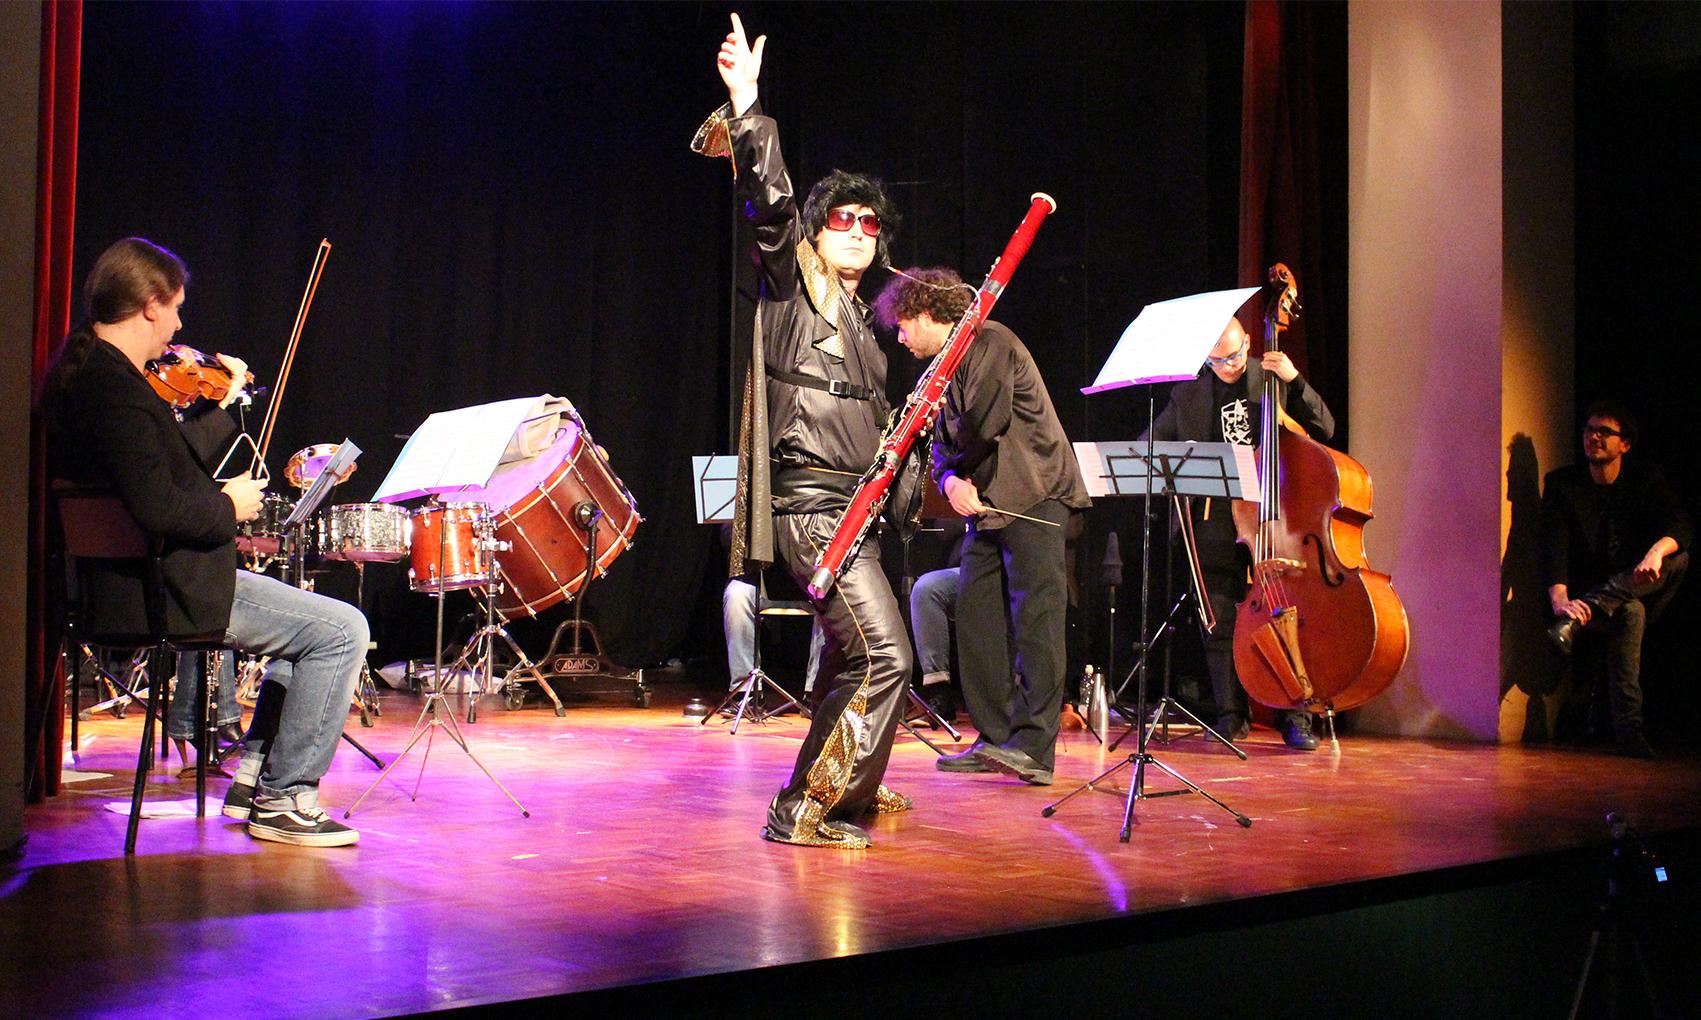 anime prave concerto orchestra machiavelli